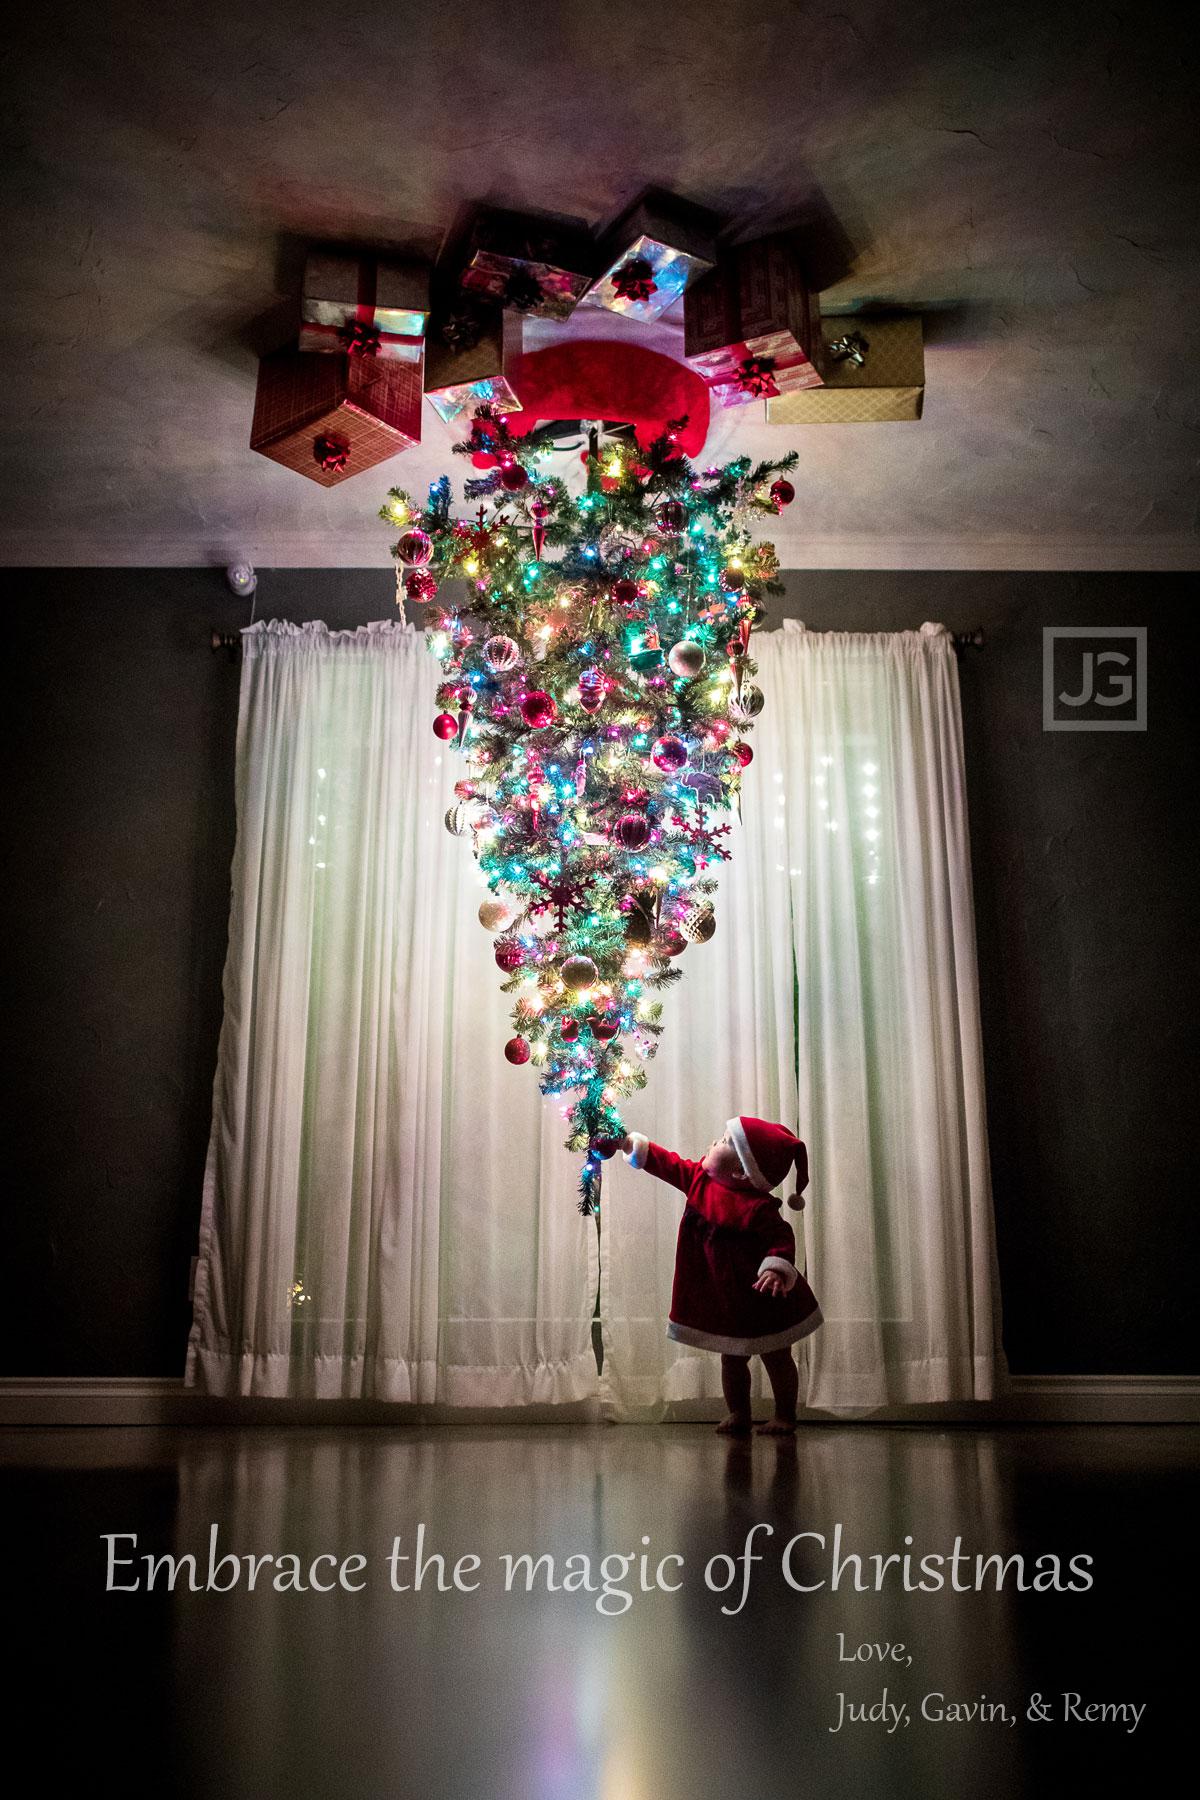 Our amazing Christmas photo